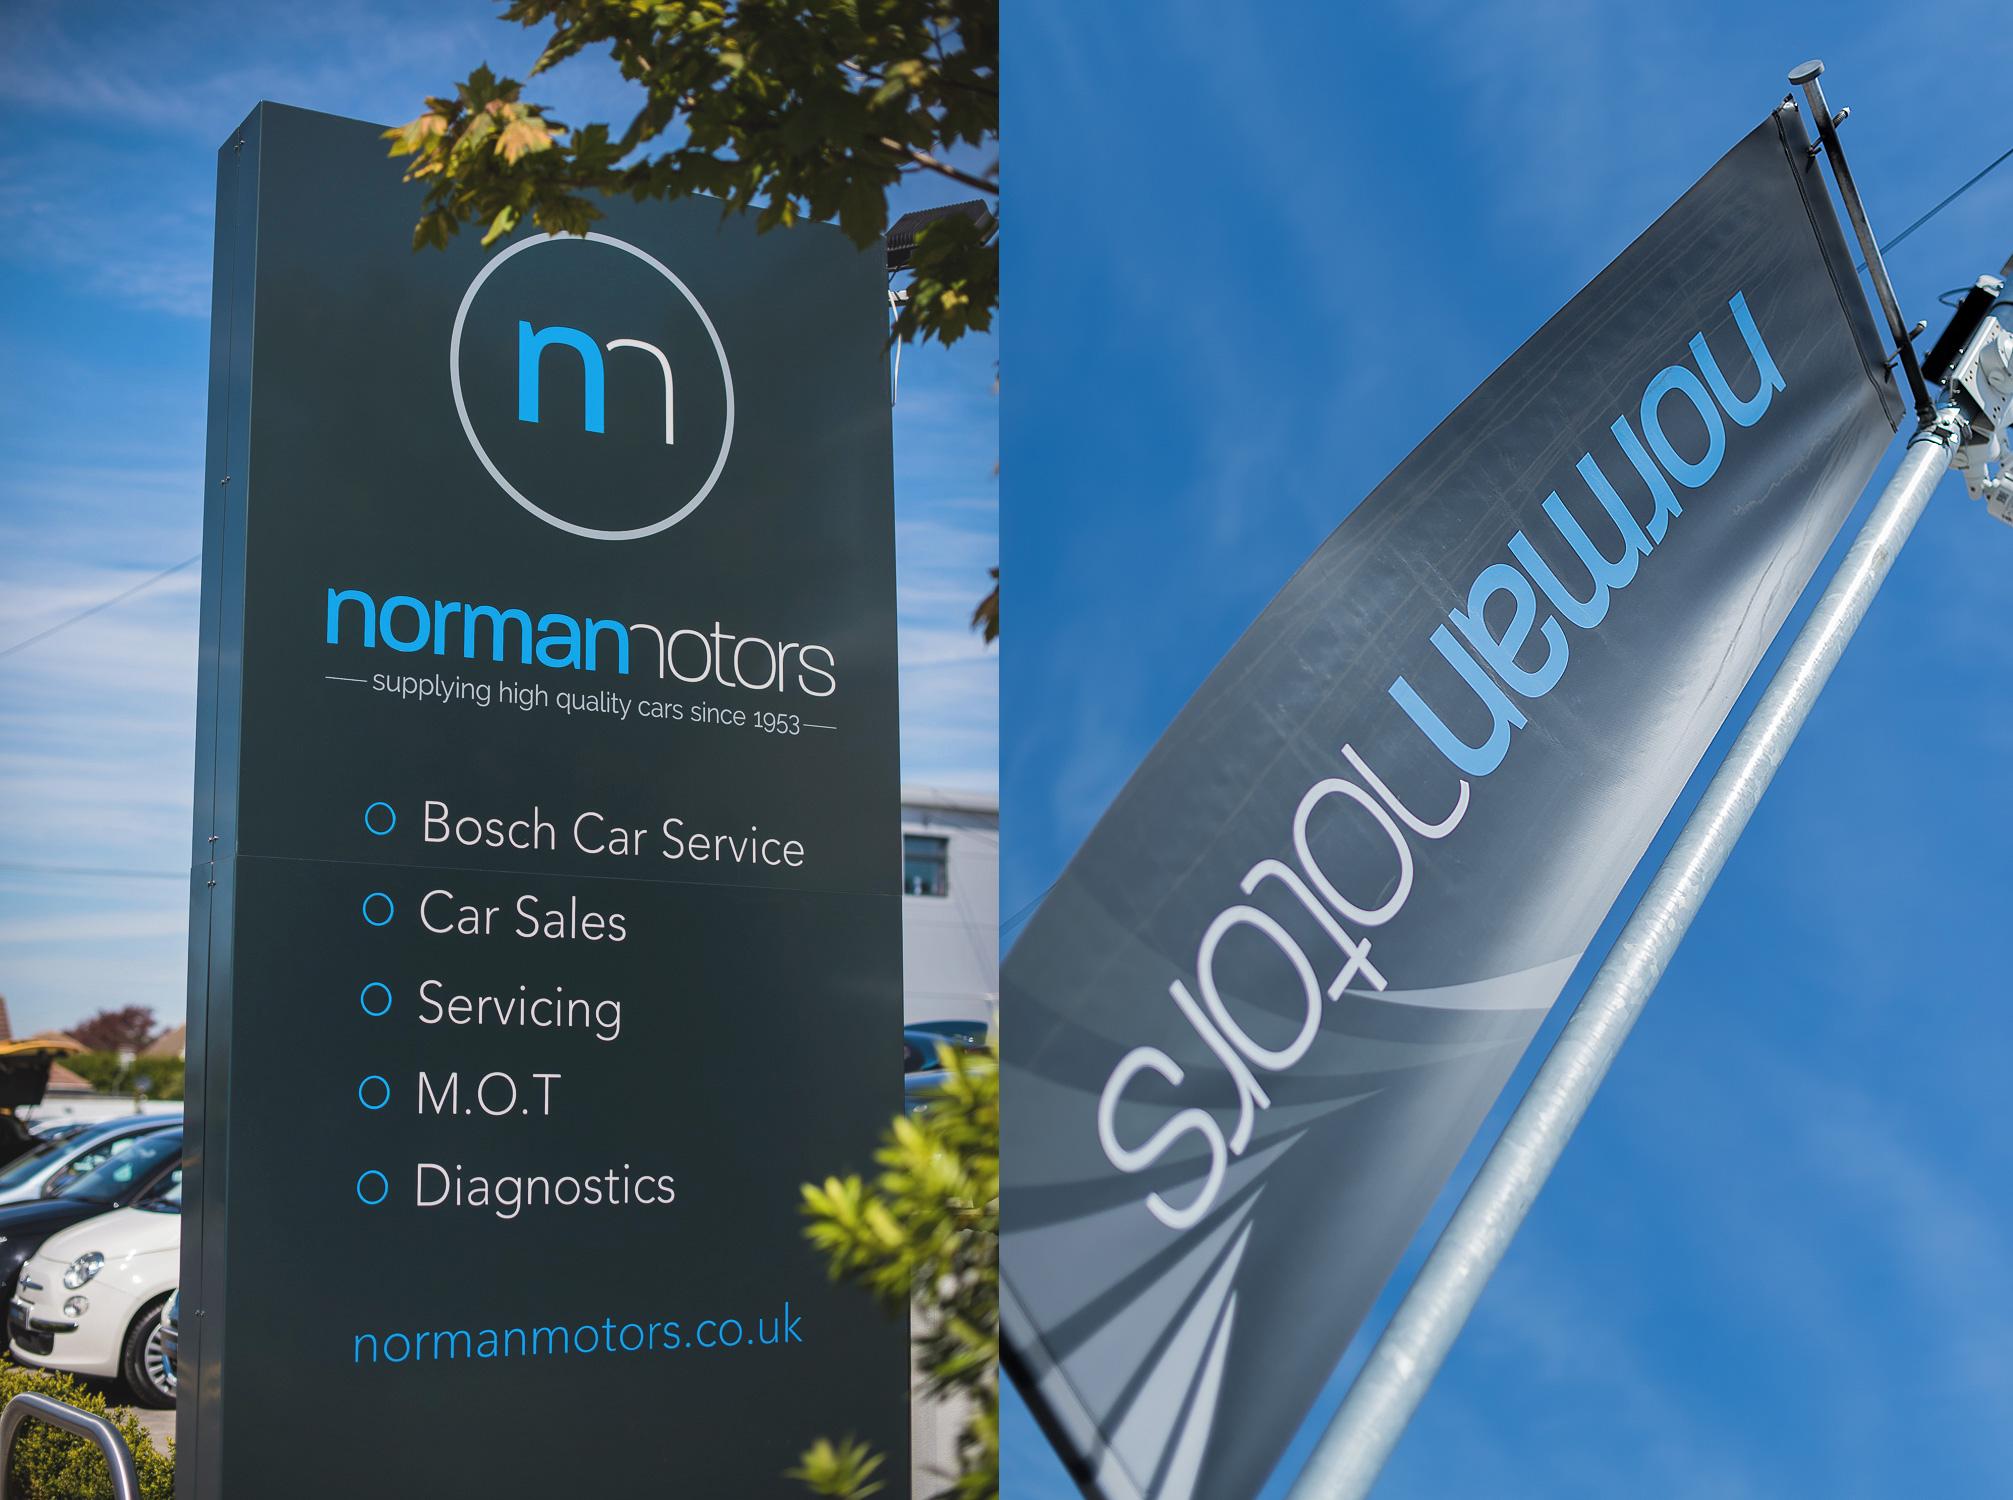 car-sales-branding-design-exterior-signage.jpg